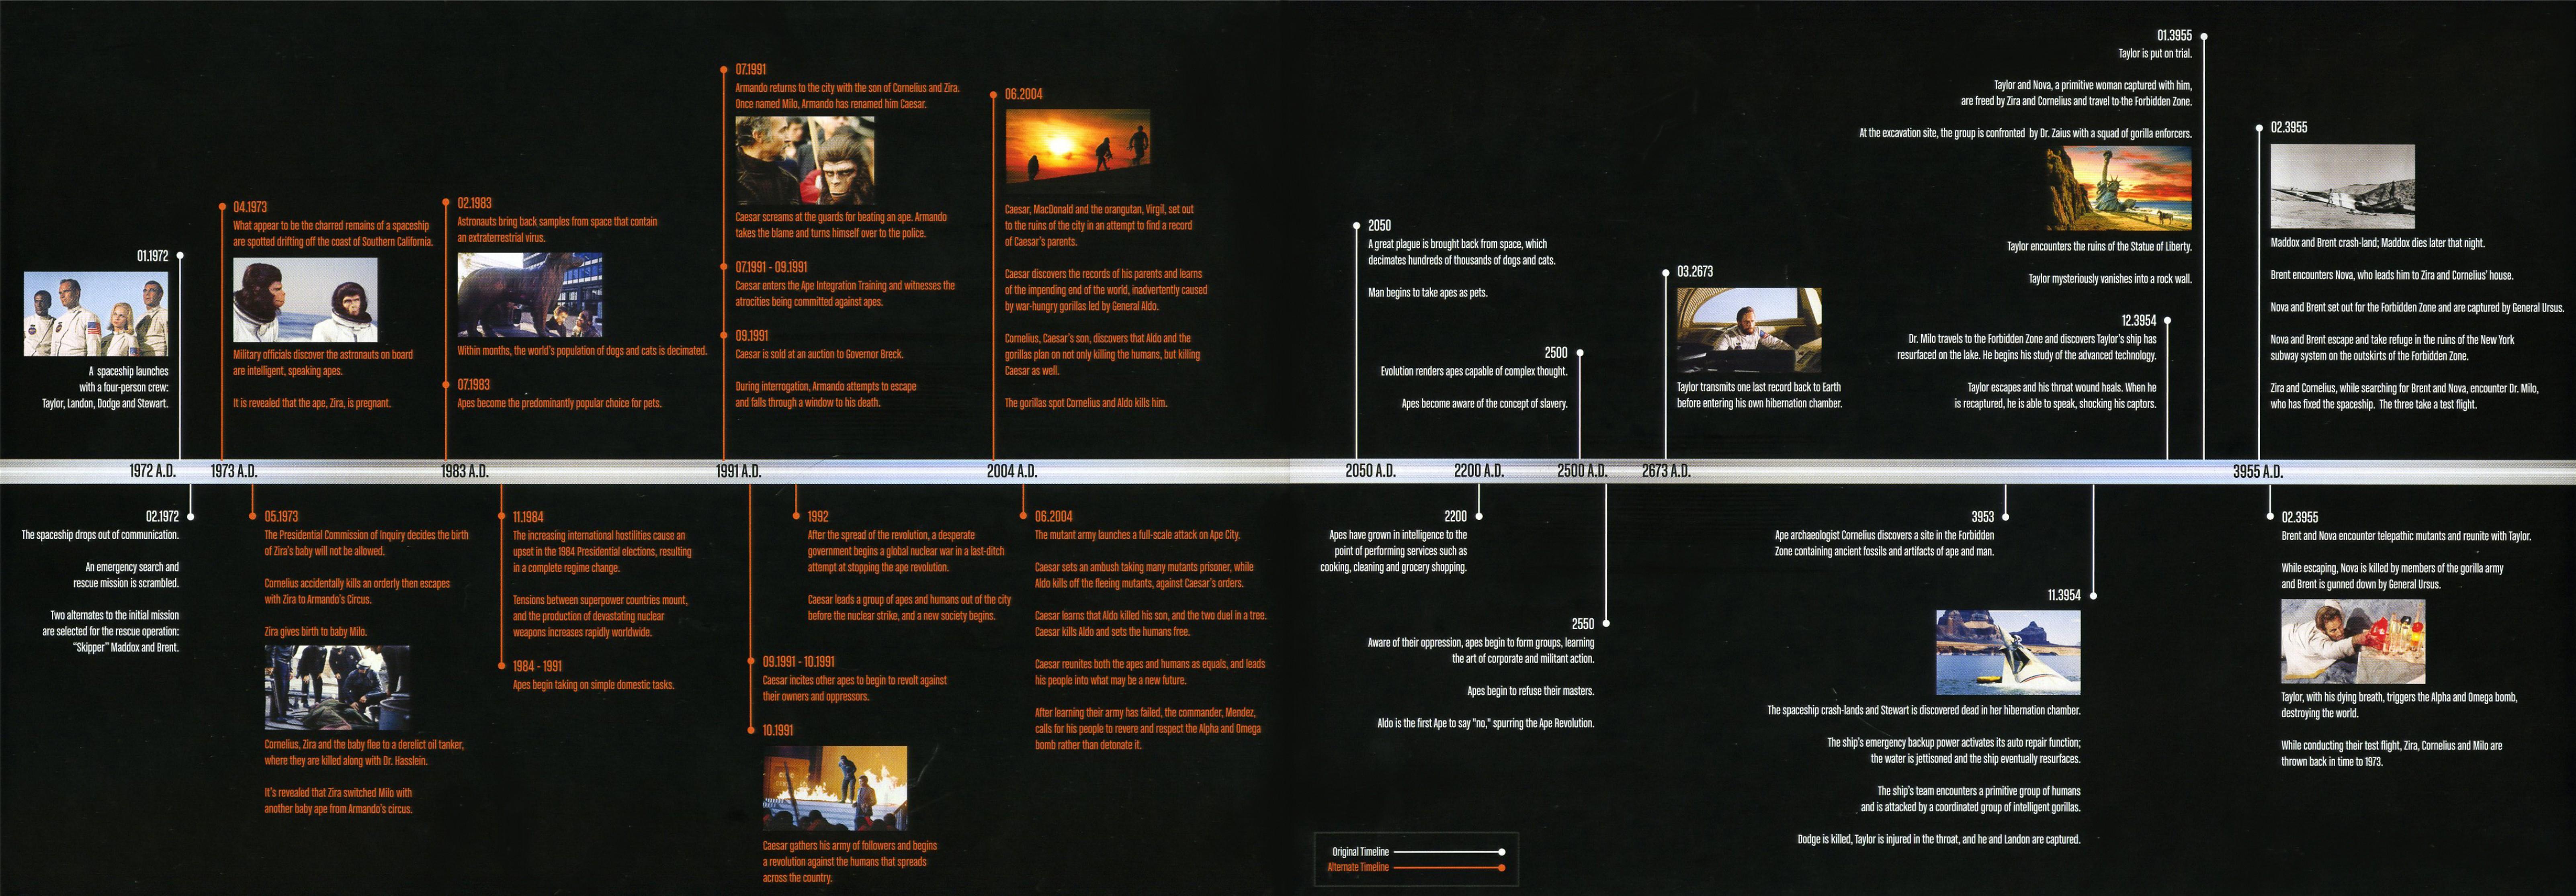 linear timelines